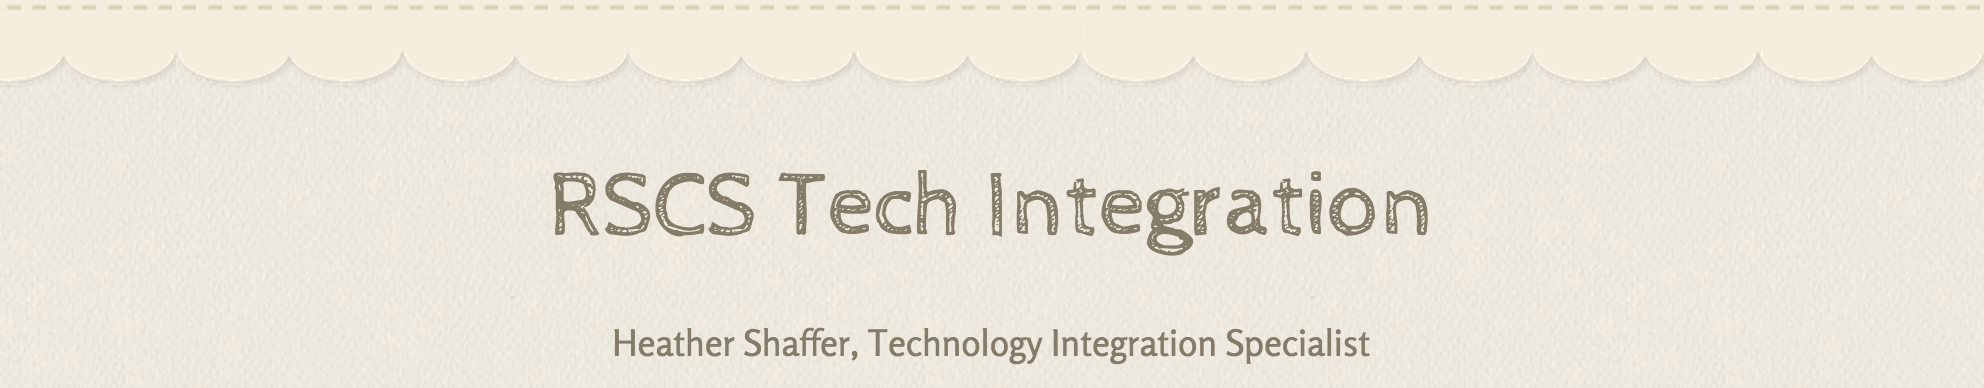 RSCS Tech Integration